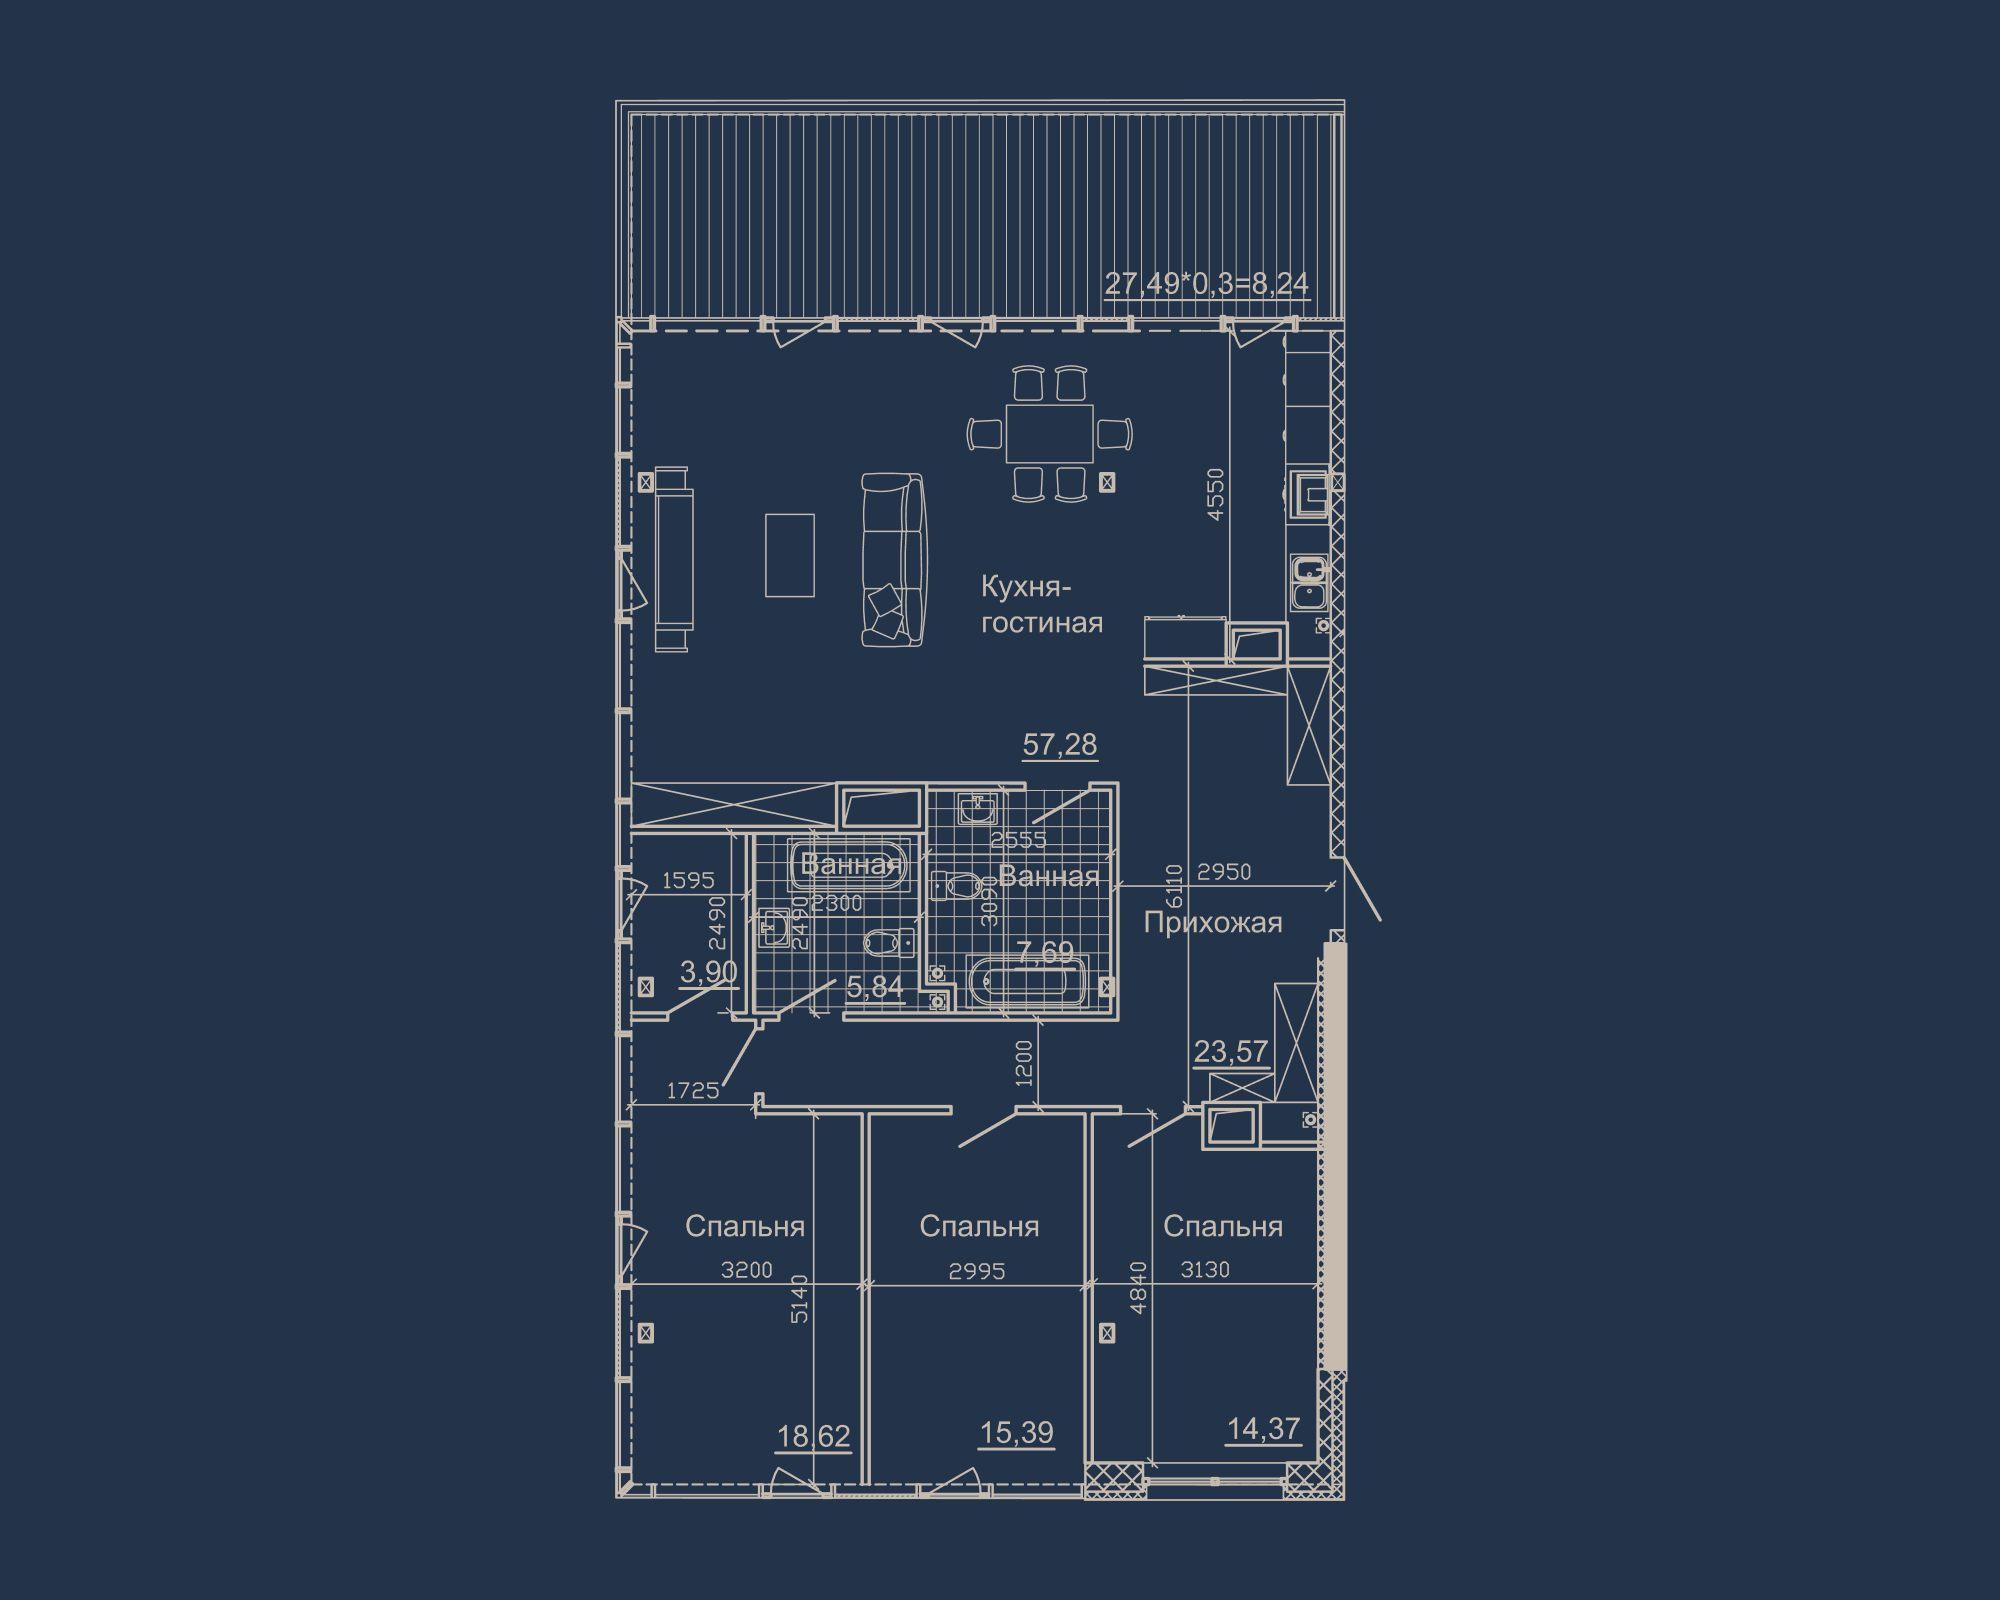 3-кімнатна квартира типу 18А у ЖК Nebo